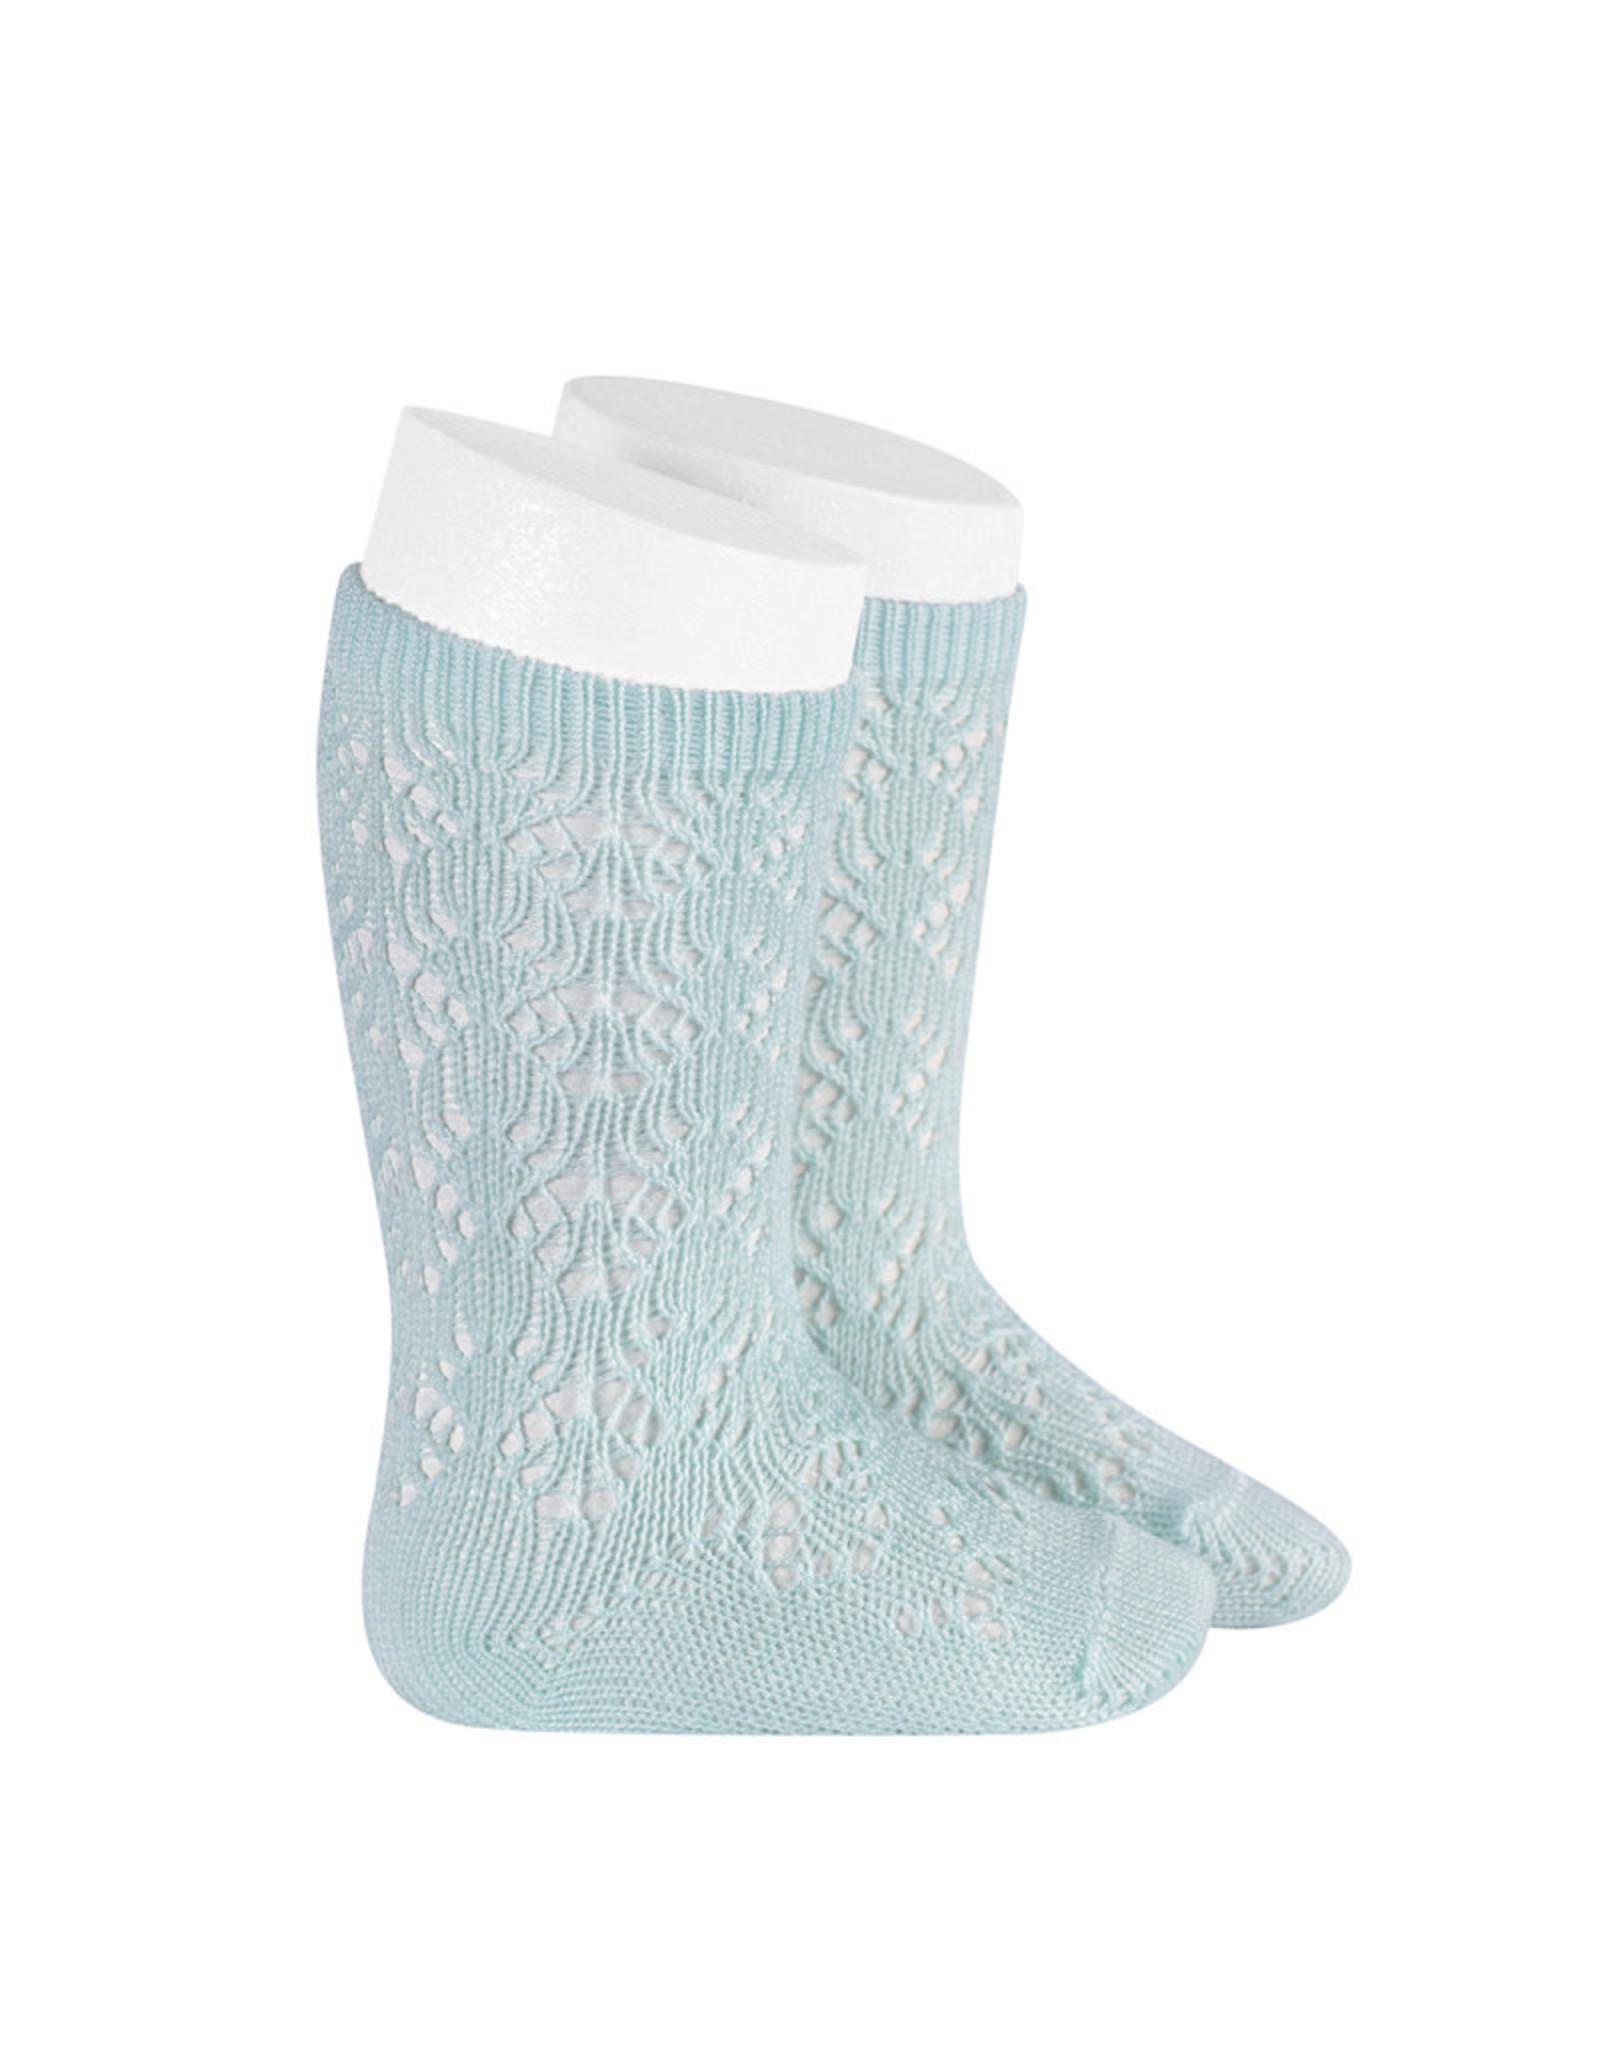 CONDOR Aquamarine Geometric Openwork Socks